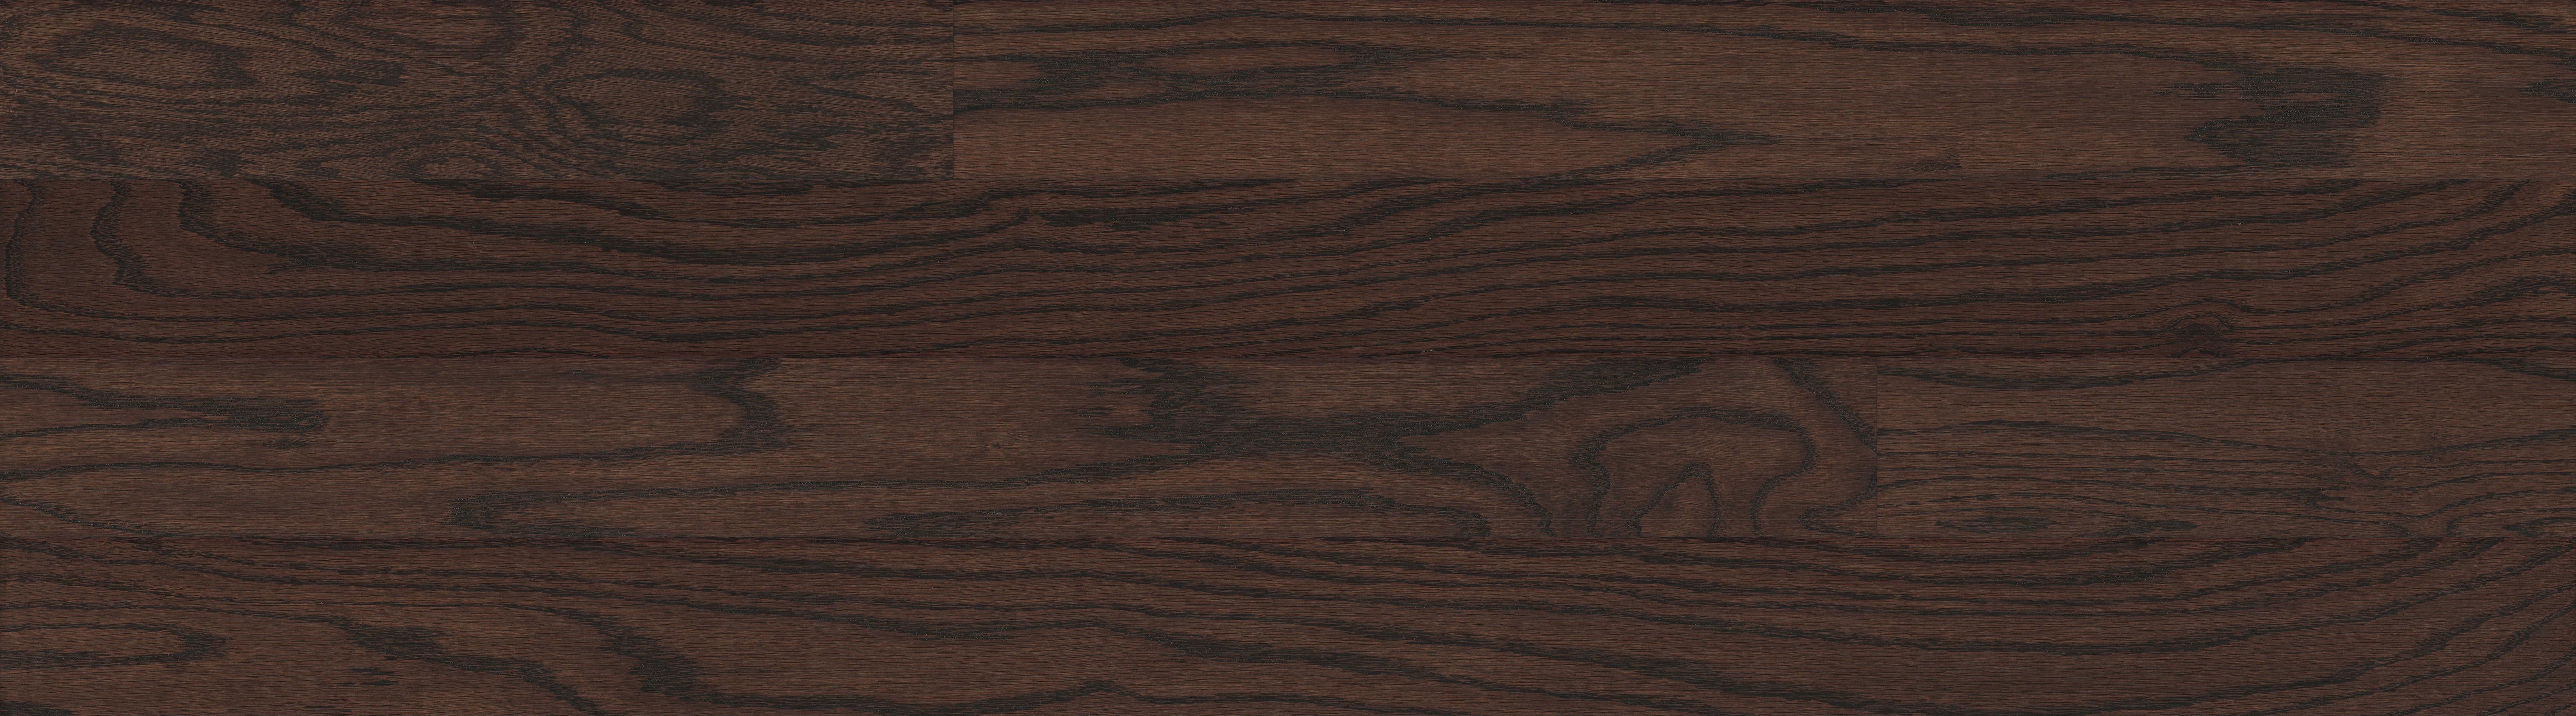 bona hardwood floor colors of https dizpos com make your own hardwood floor home remodel inside difference between laminate and engineered hardwood unique mullican ridgecrest oak burnt umber 1 2quot thick 5quot wide engineered images of difference